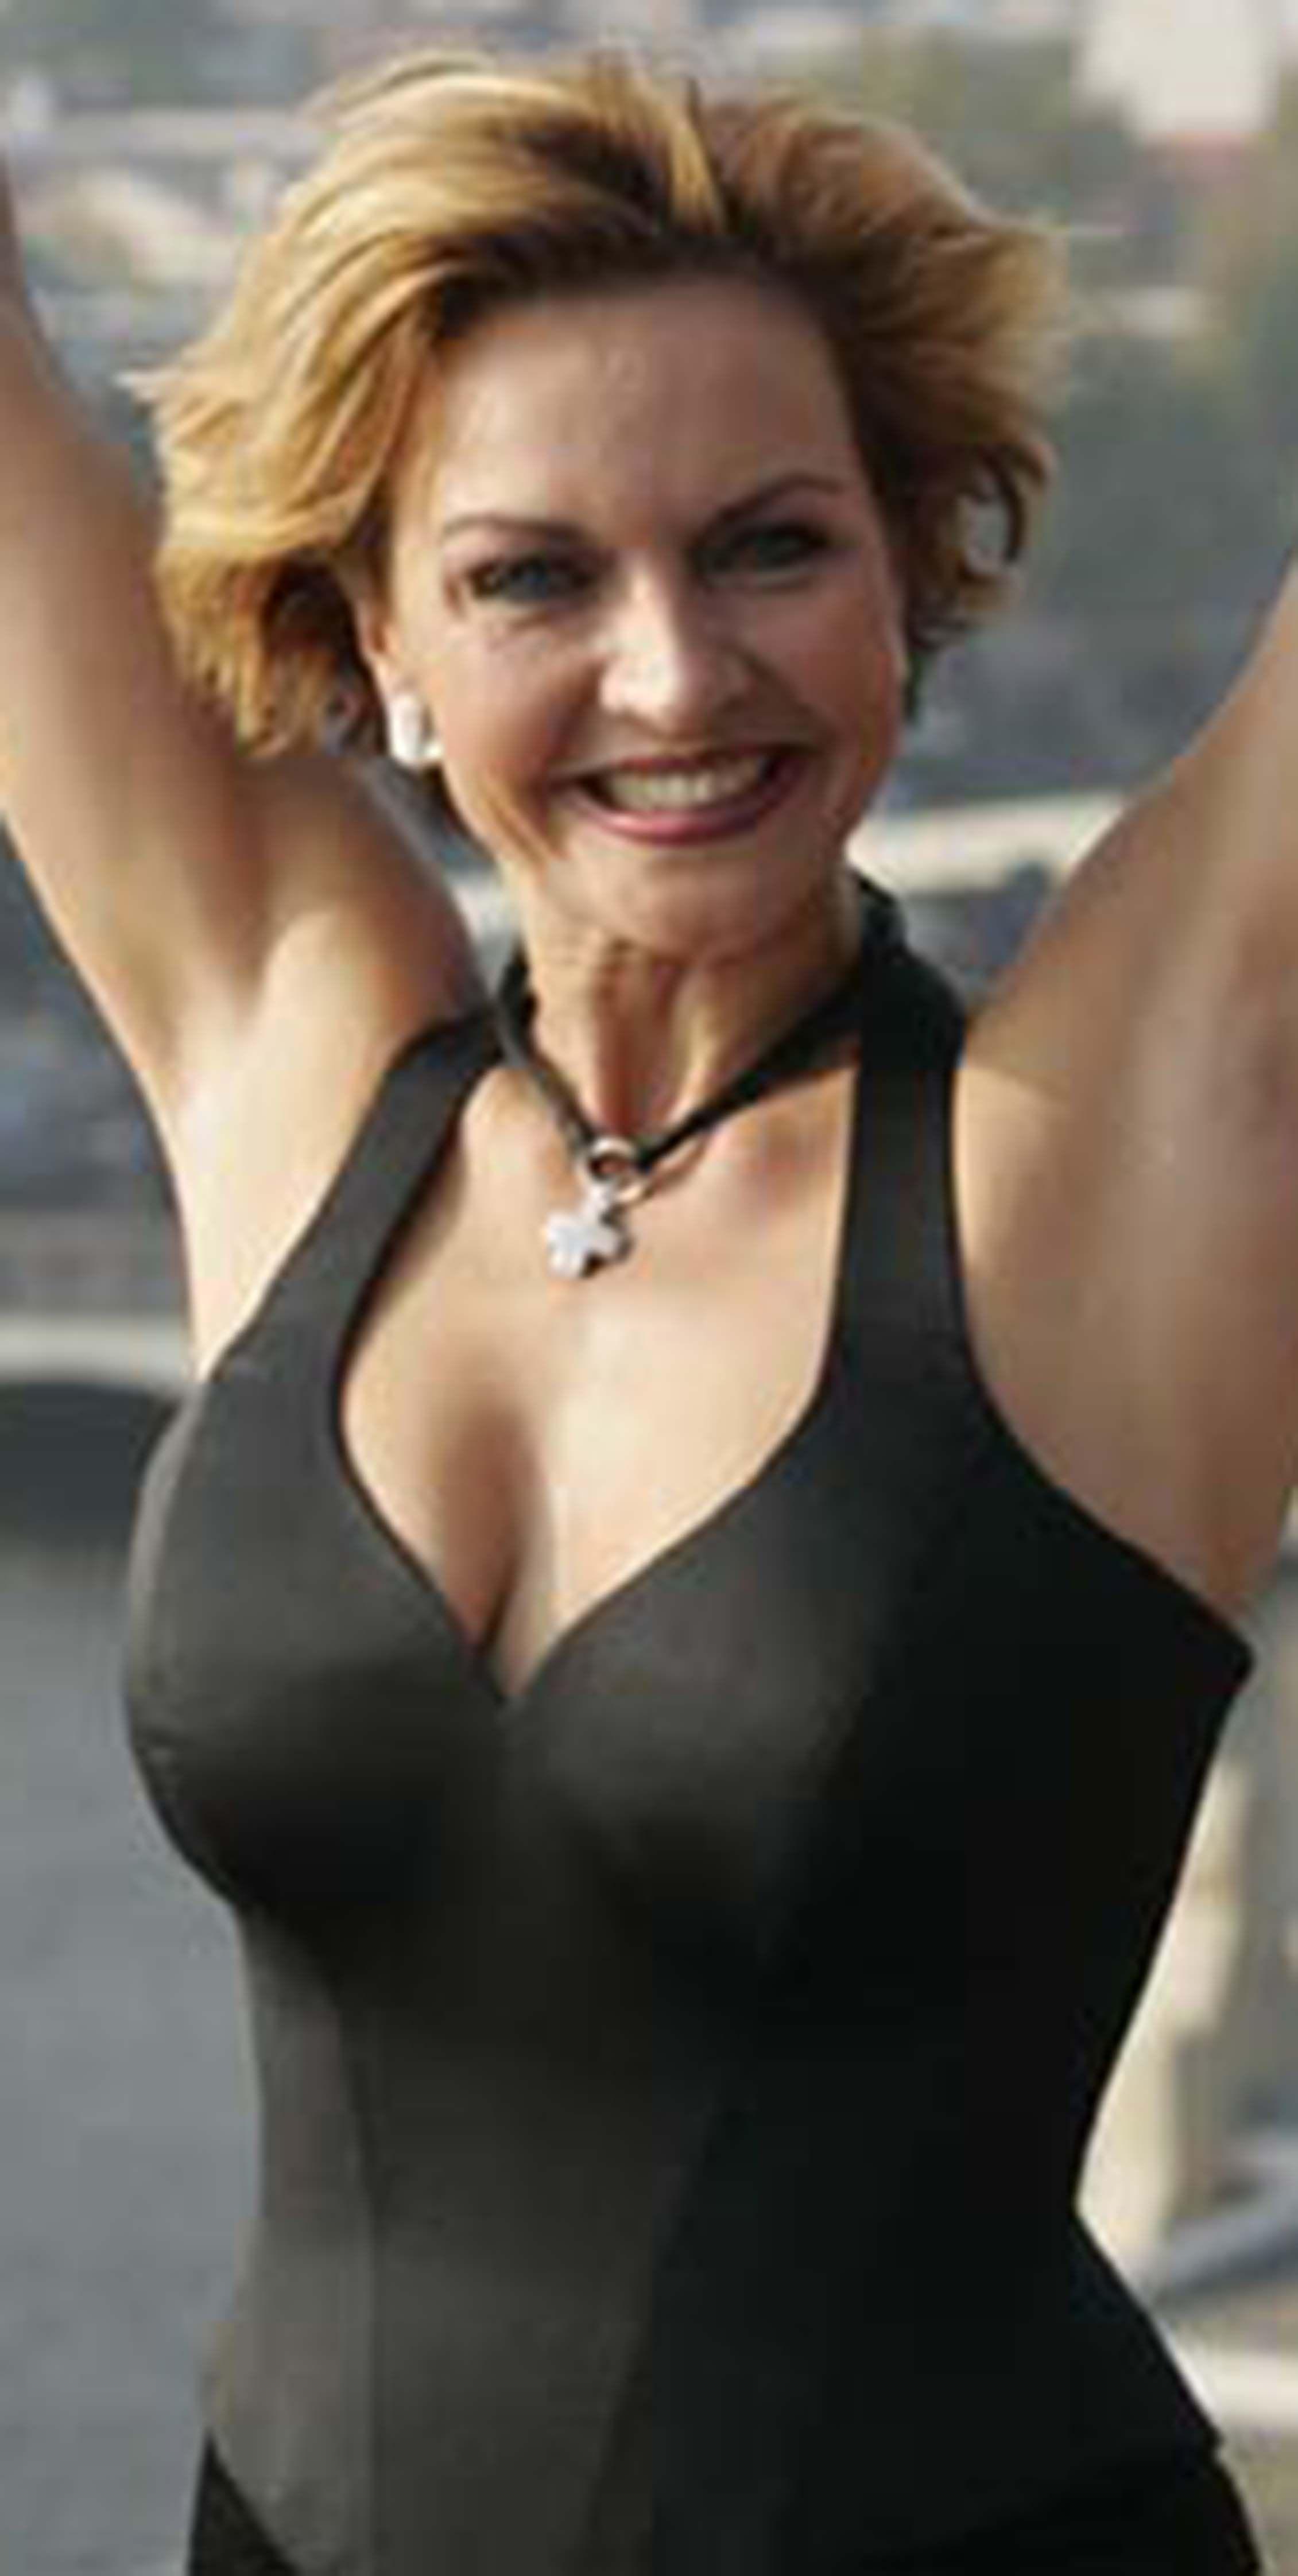 pinseamus milad on mature   pinterest   woman